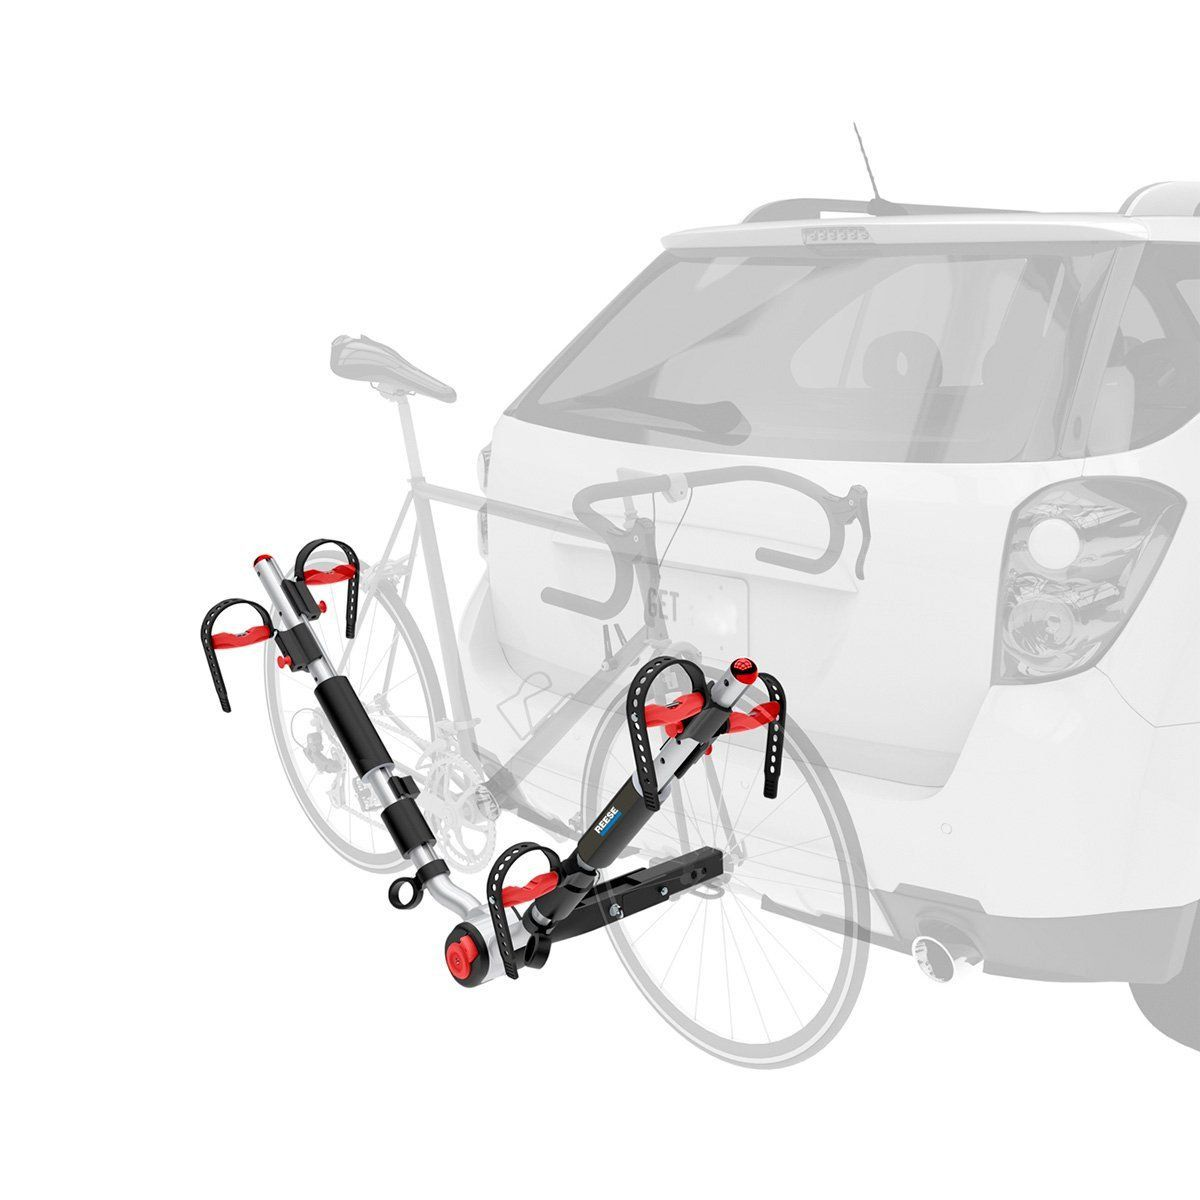 Suporte de Bicicletas Transbike p/ Engate Removível 2 Bikes Reese